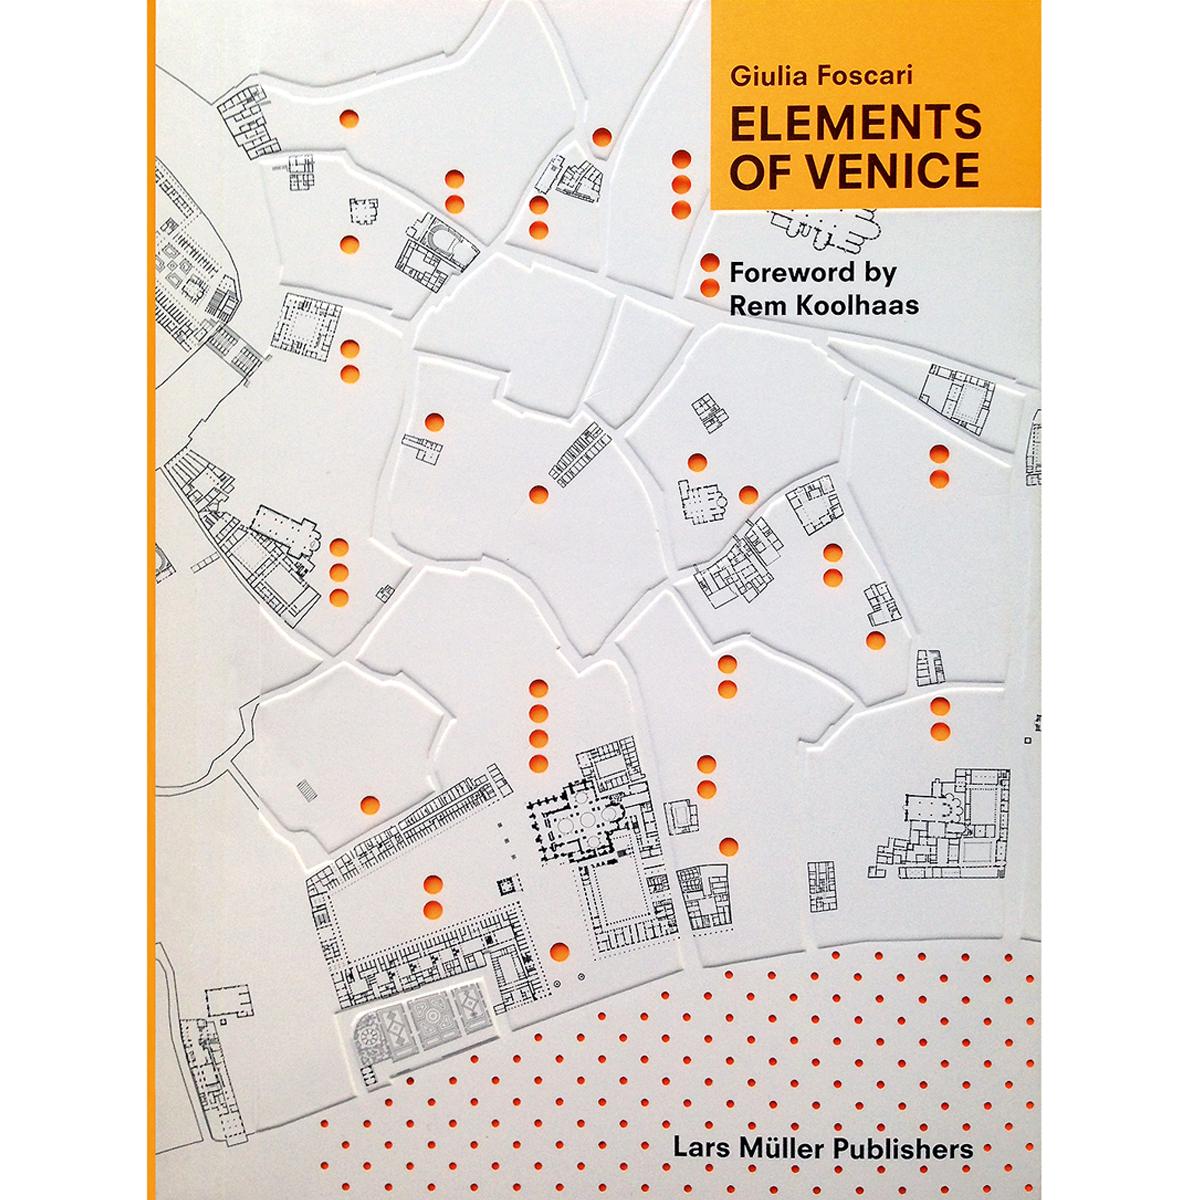 Elements of Venice